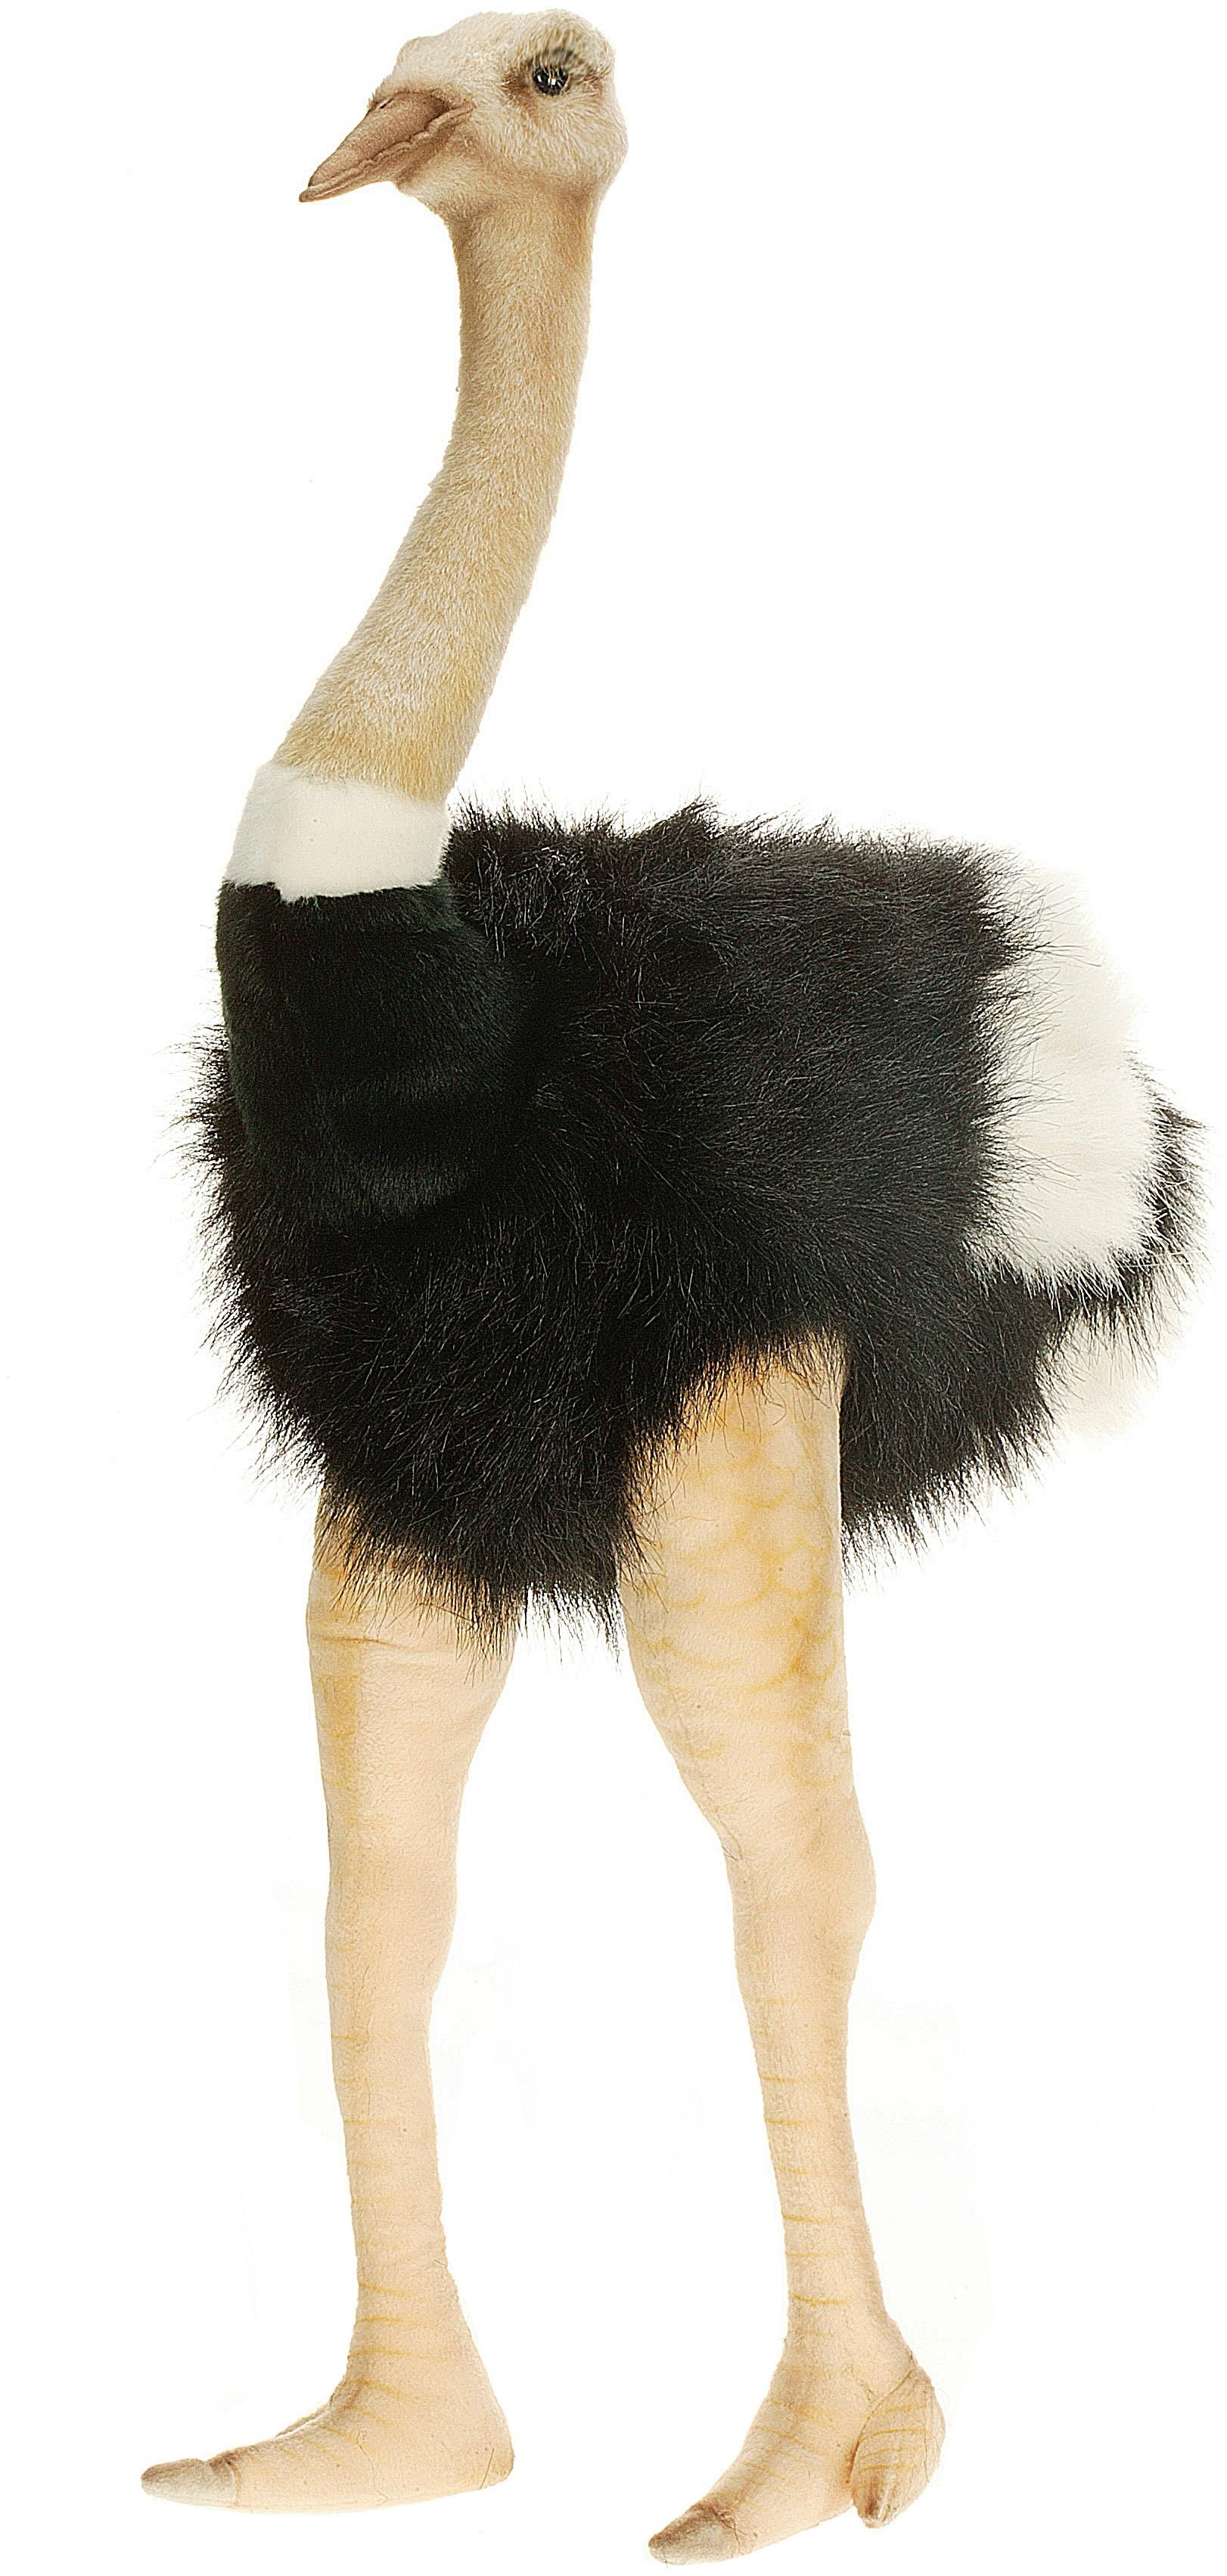 31 Male Ostrich Stuffed Animal